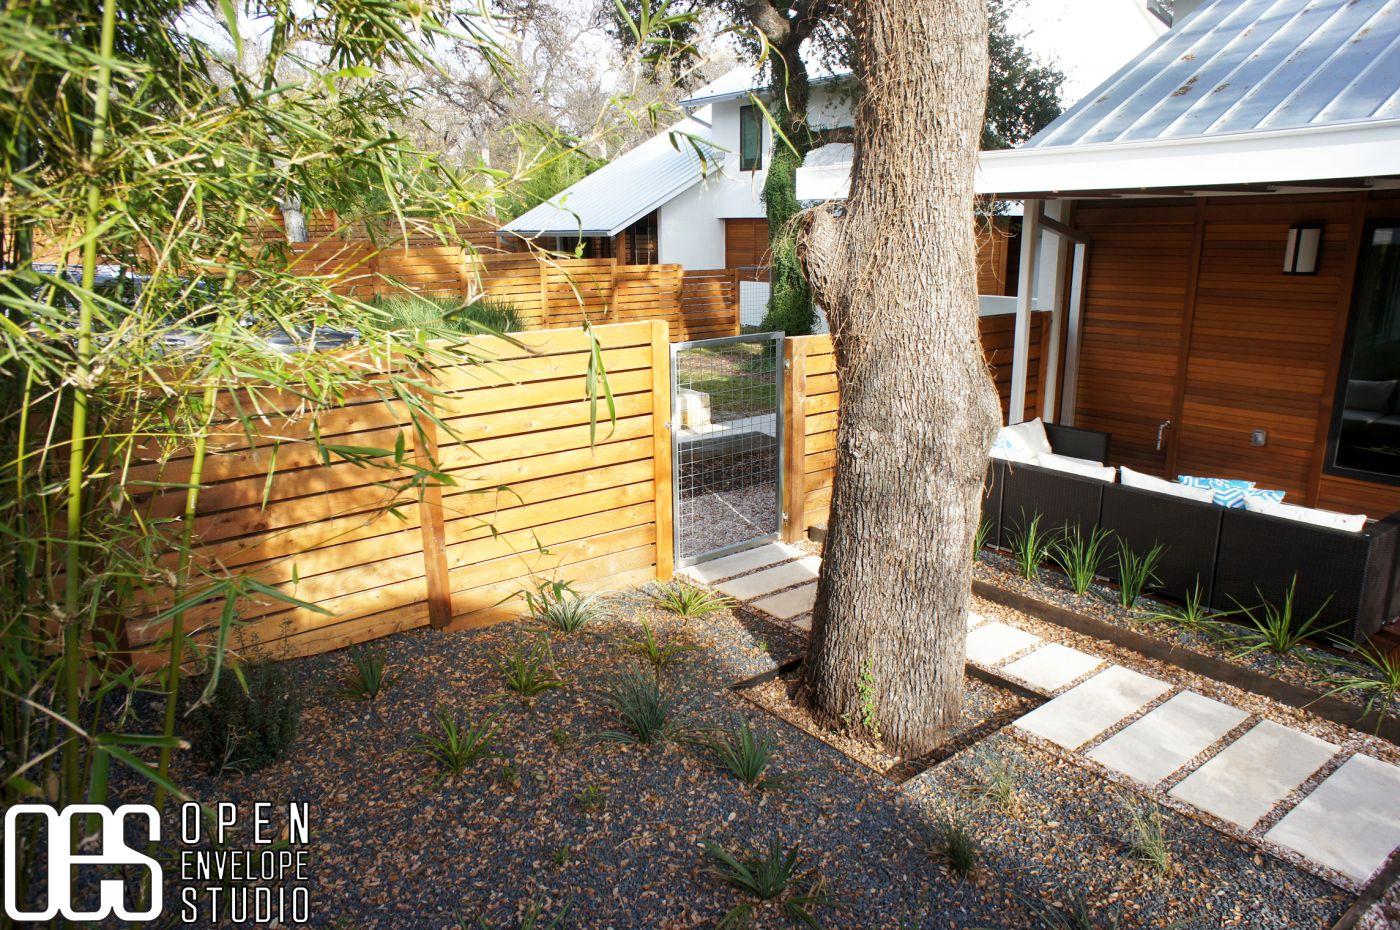 OES | Tejas black planting bed, limestone paver entry